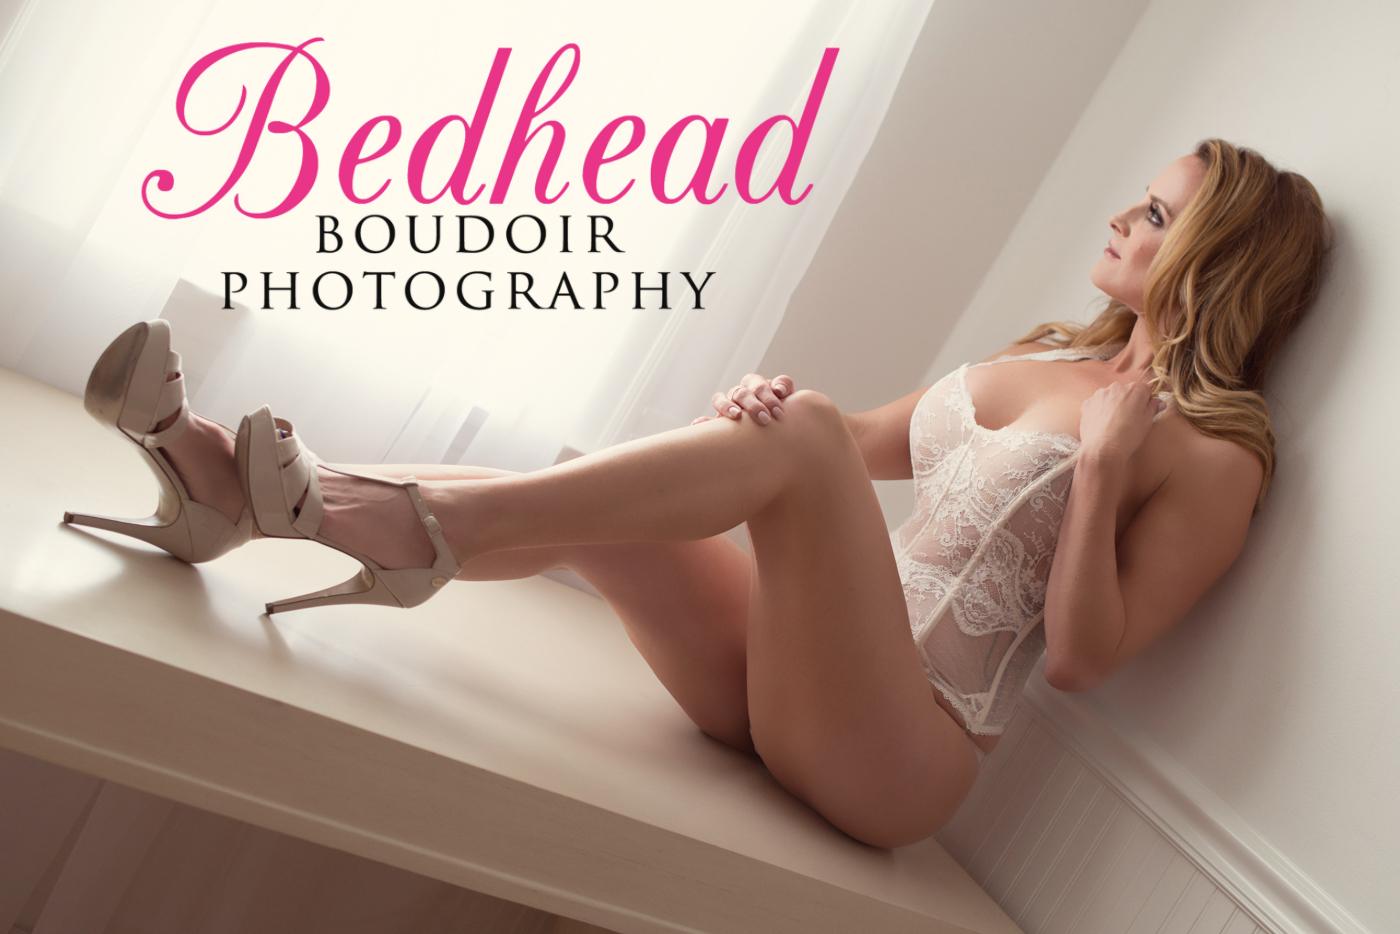 Bedhead_Boudoir_Photography_Chicago-19.jpg